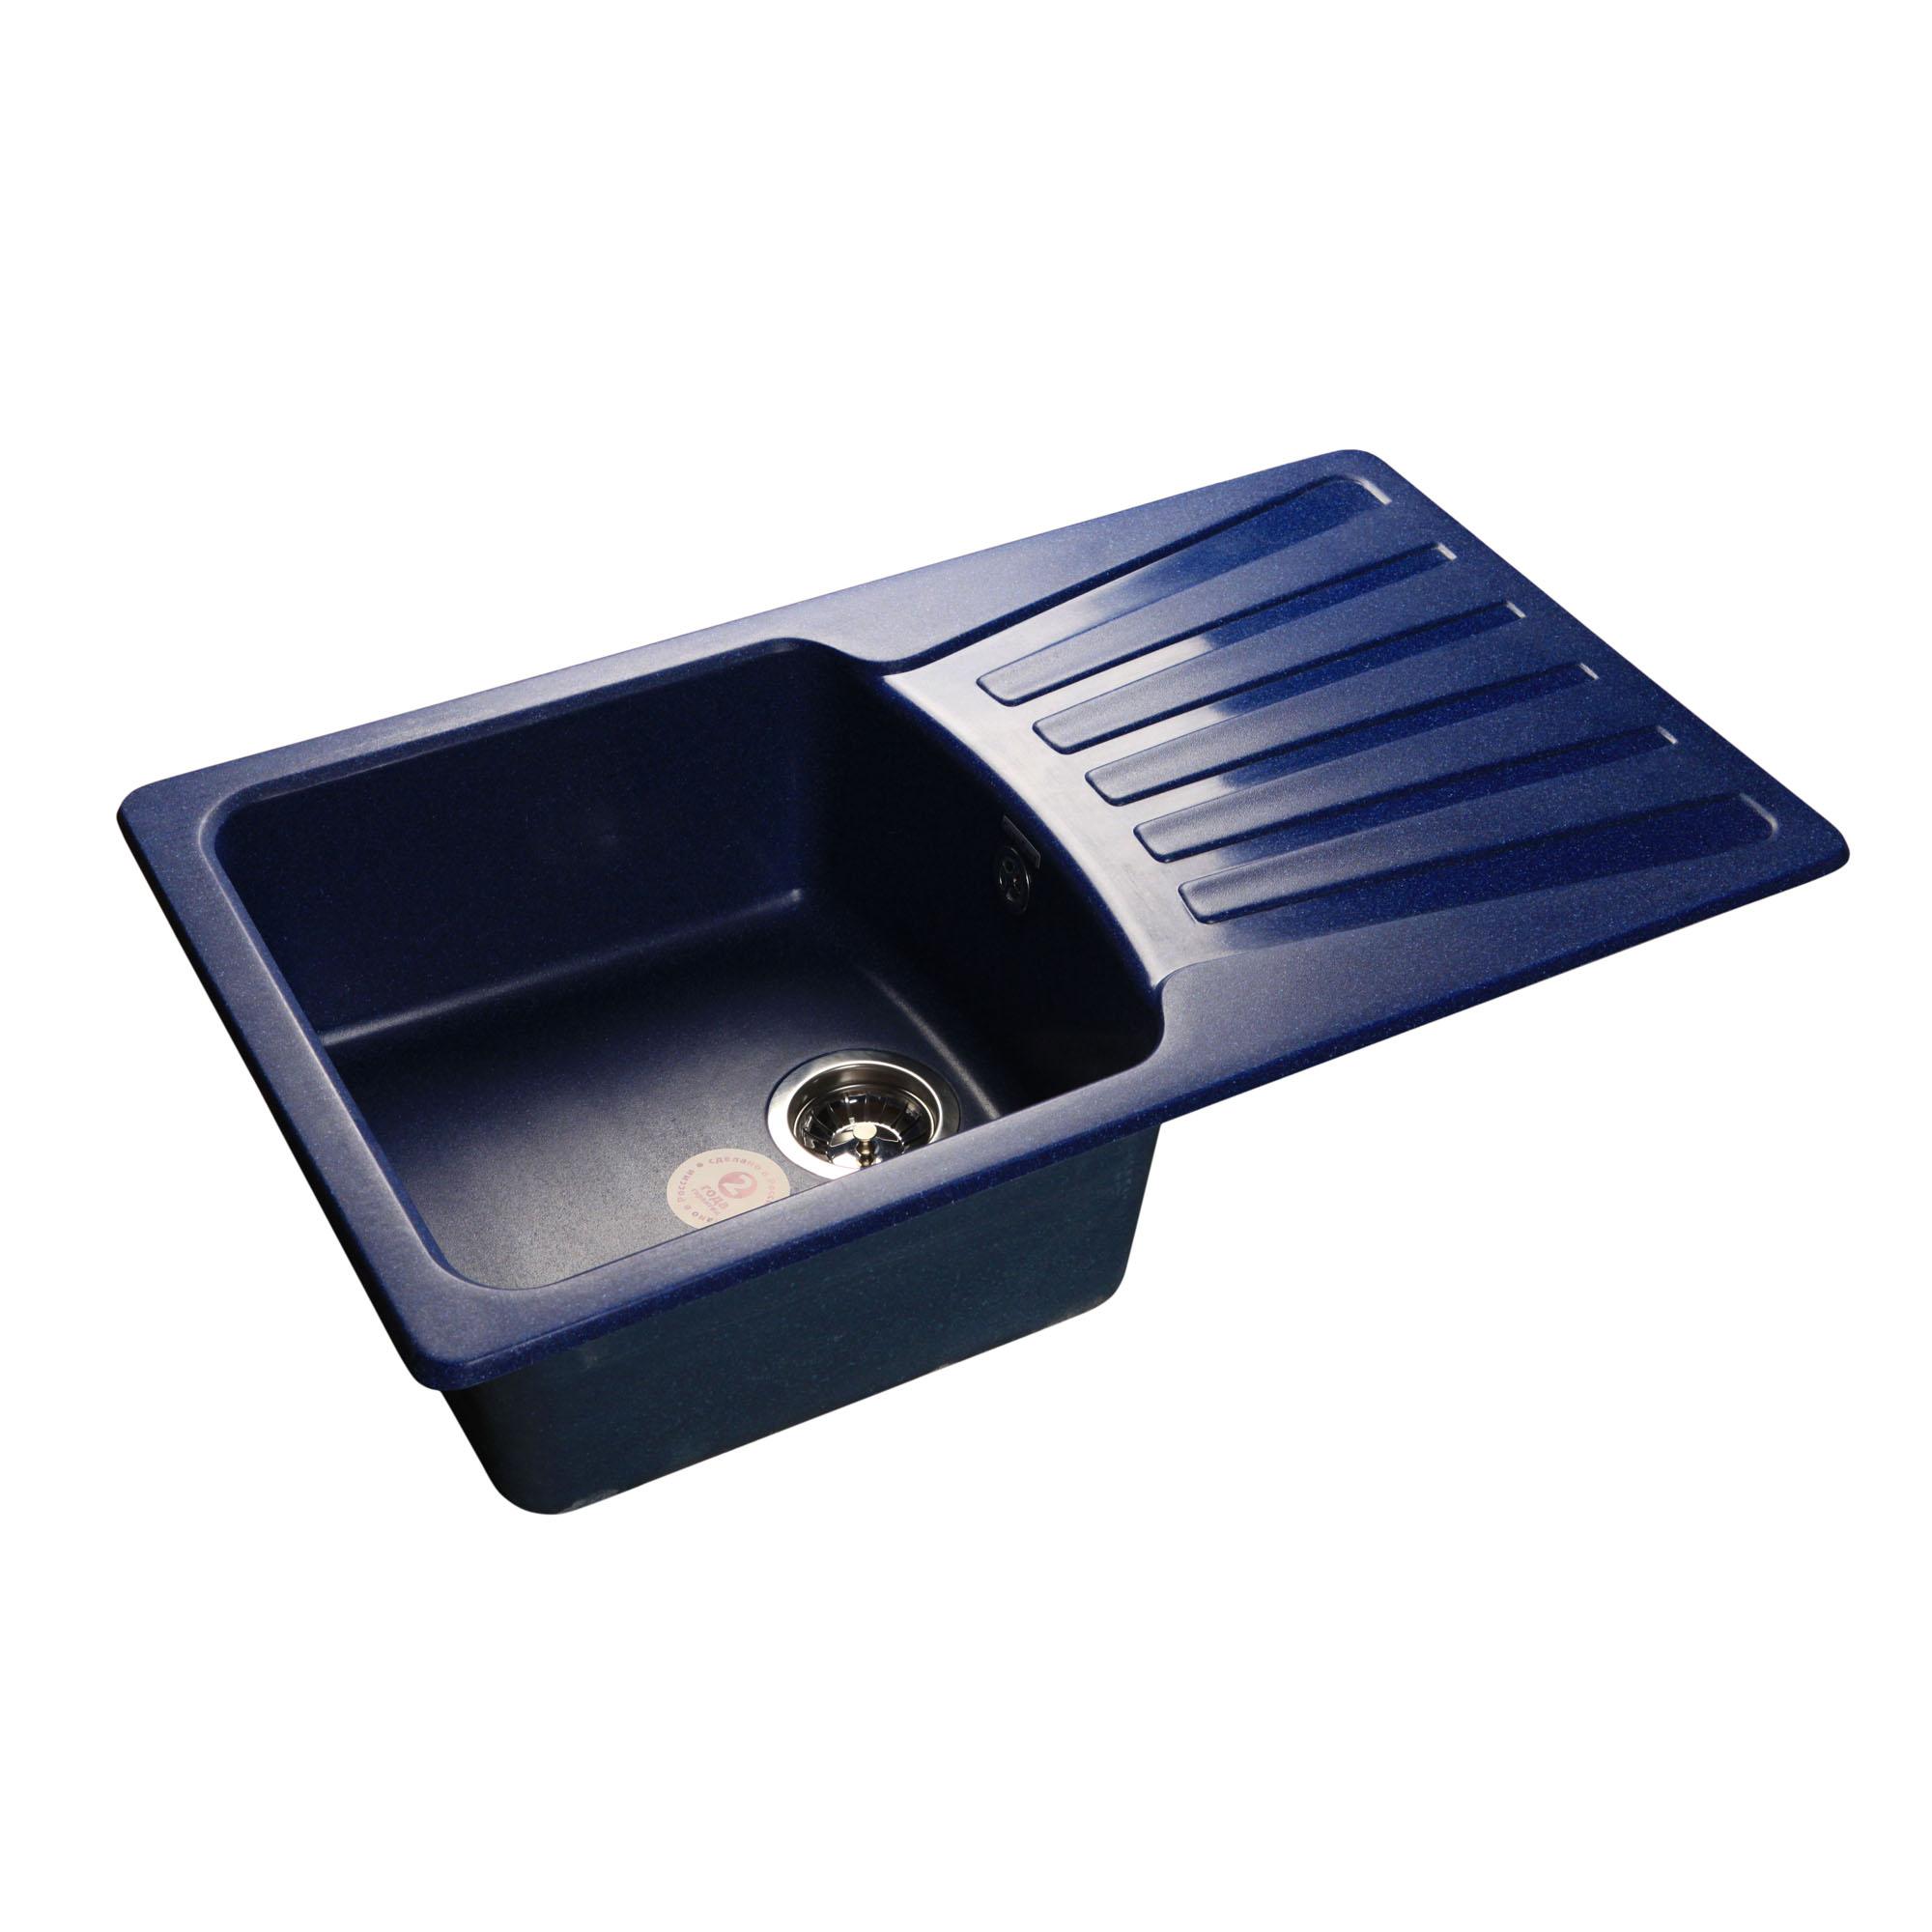 Кухонная мойка GranFest Standart GF-S850L синий мойка кухонная granfest гранит 850x495 gf s850l терракот